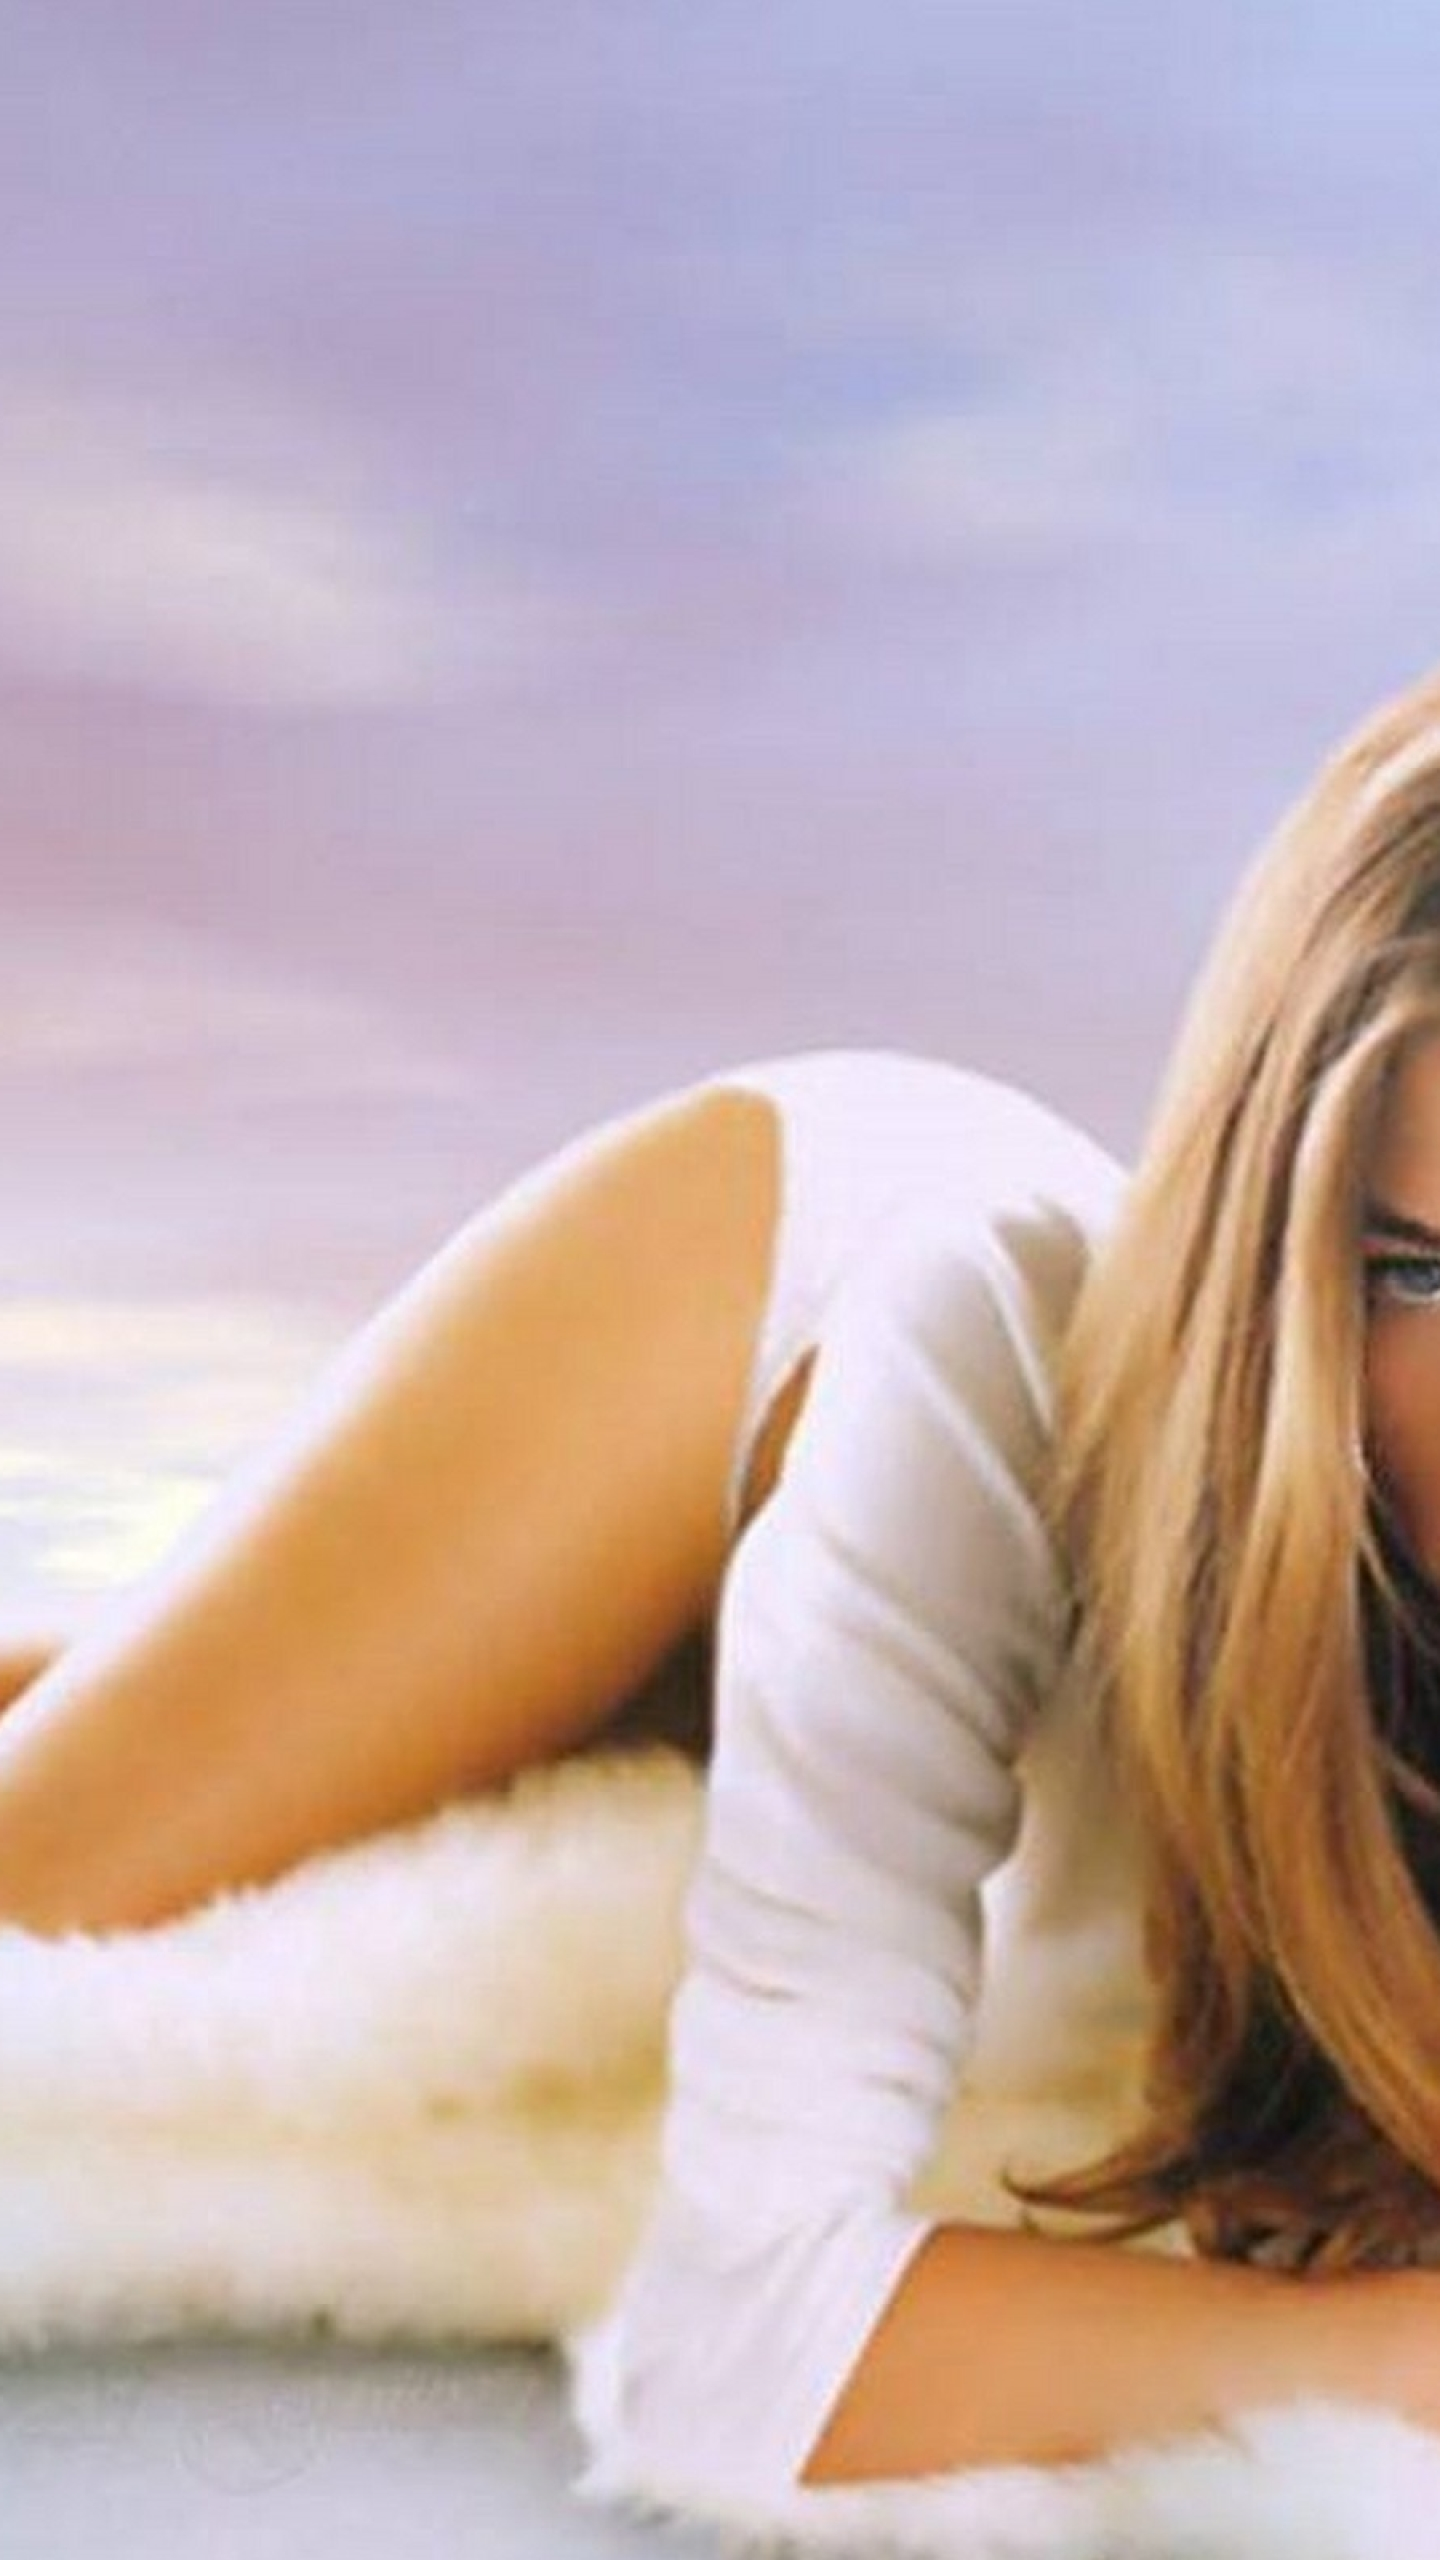 Denise Richards New Sexy Photoshoot, Full HD 2K Wallpaper